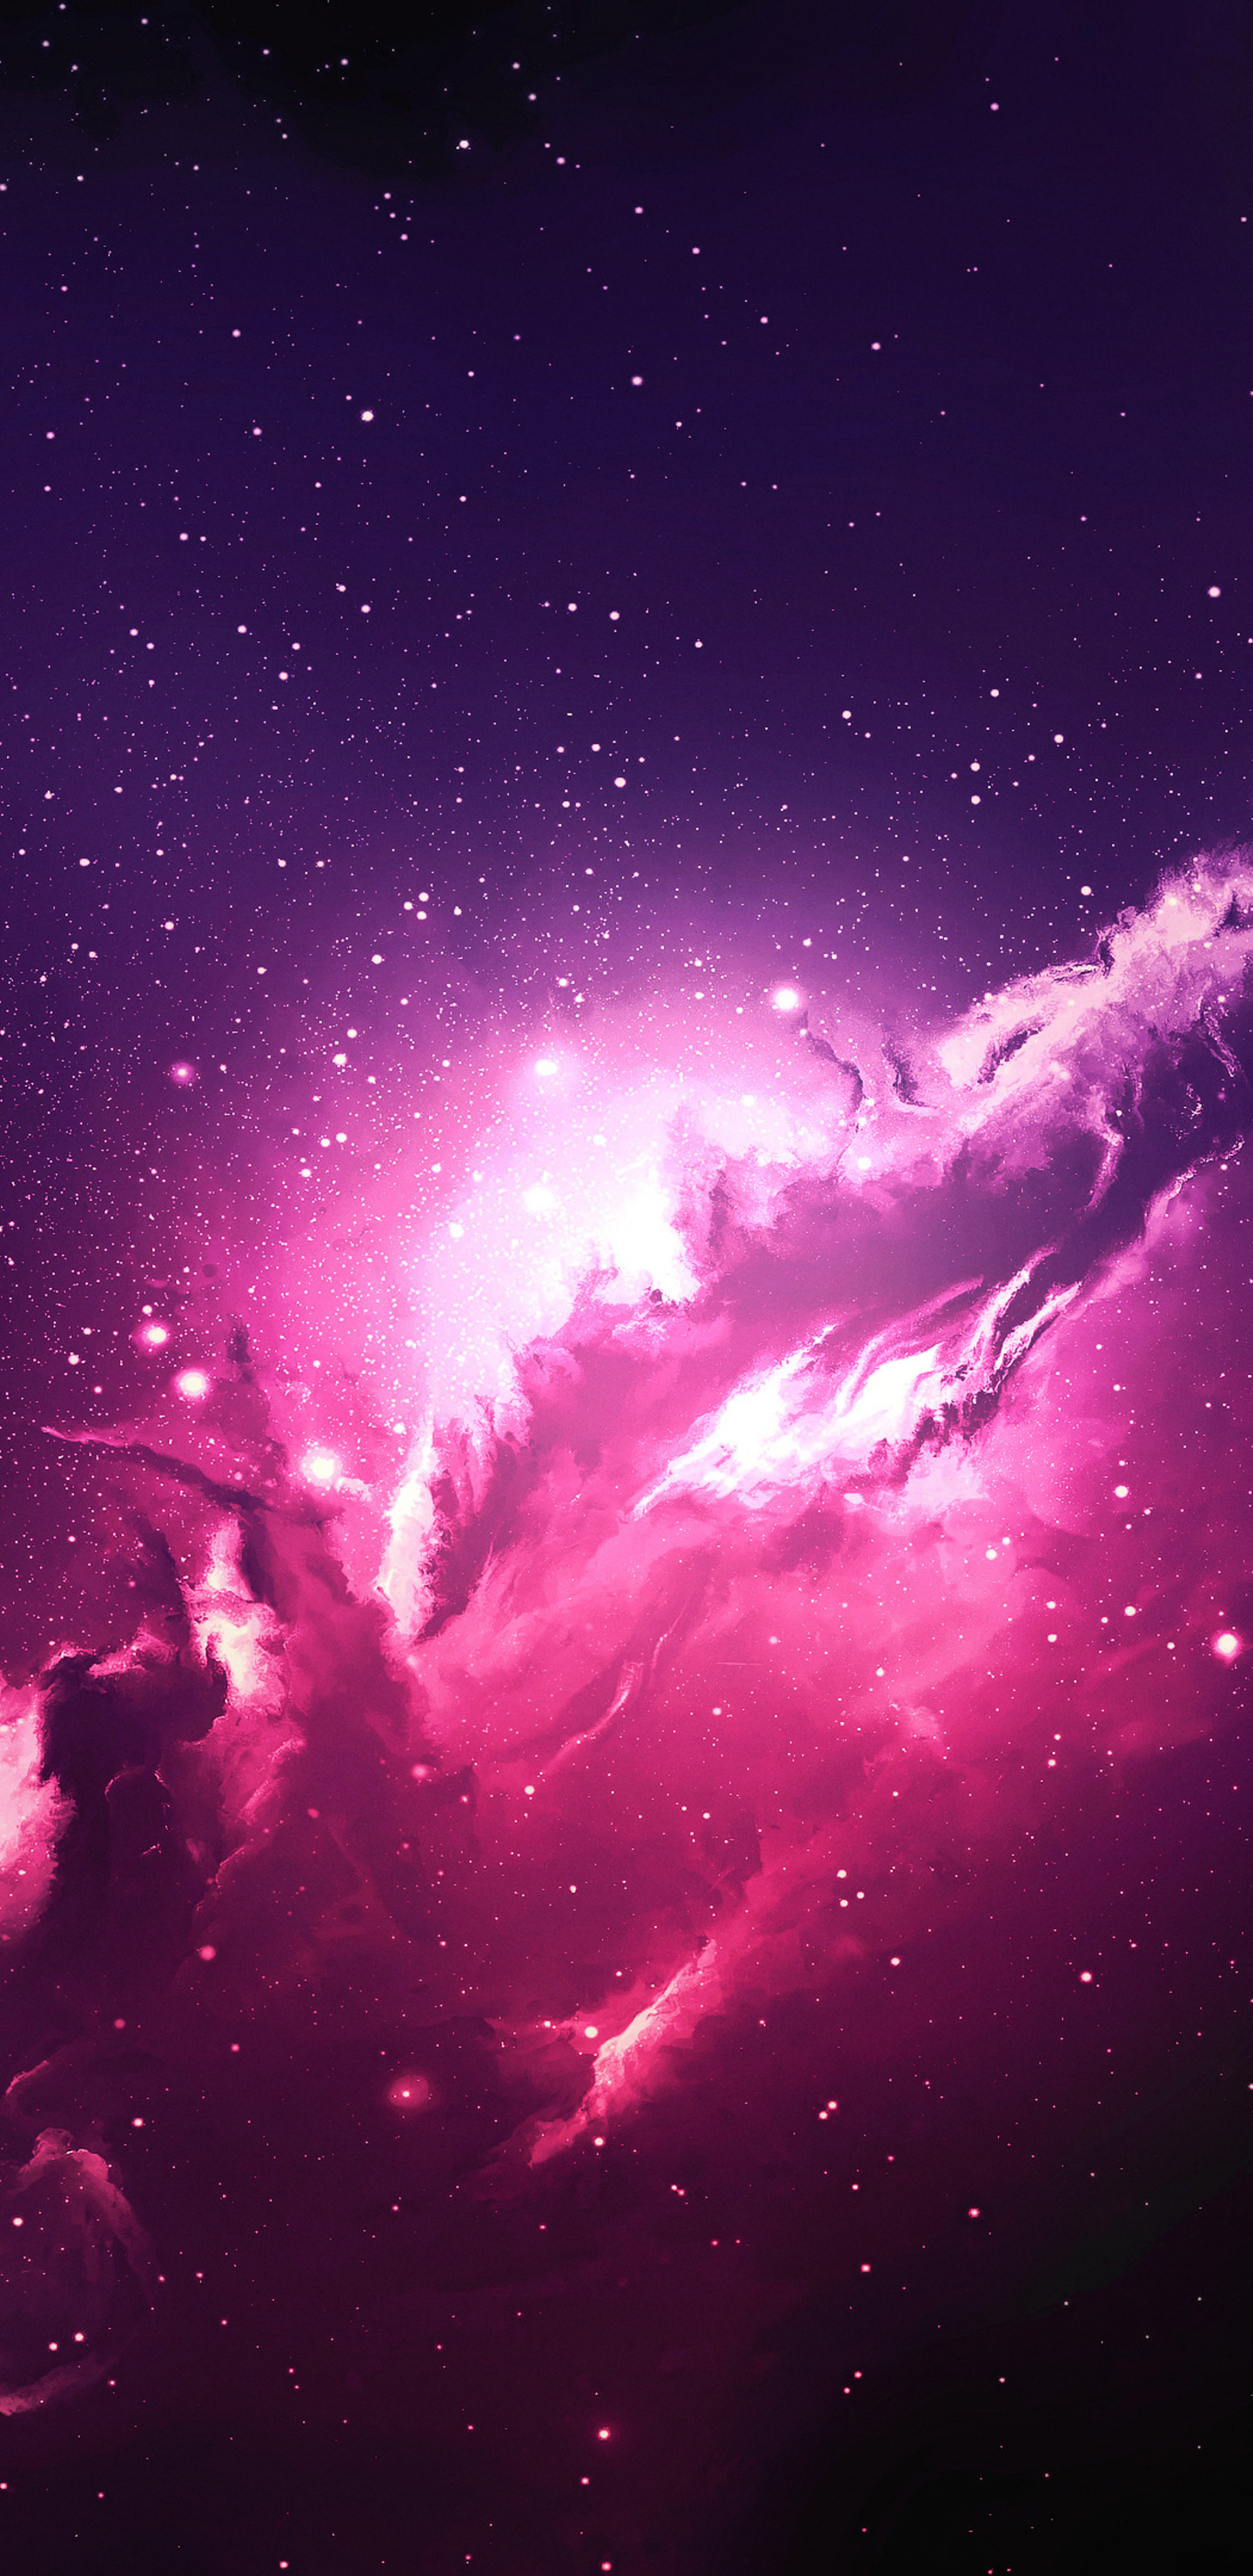 1440x2960 nebula stars universe galaxy space 4k samsung galaxy s8